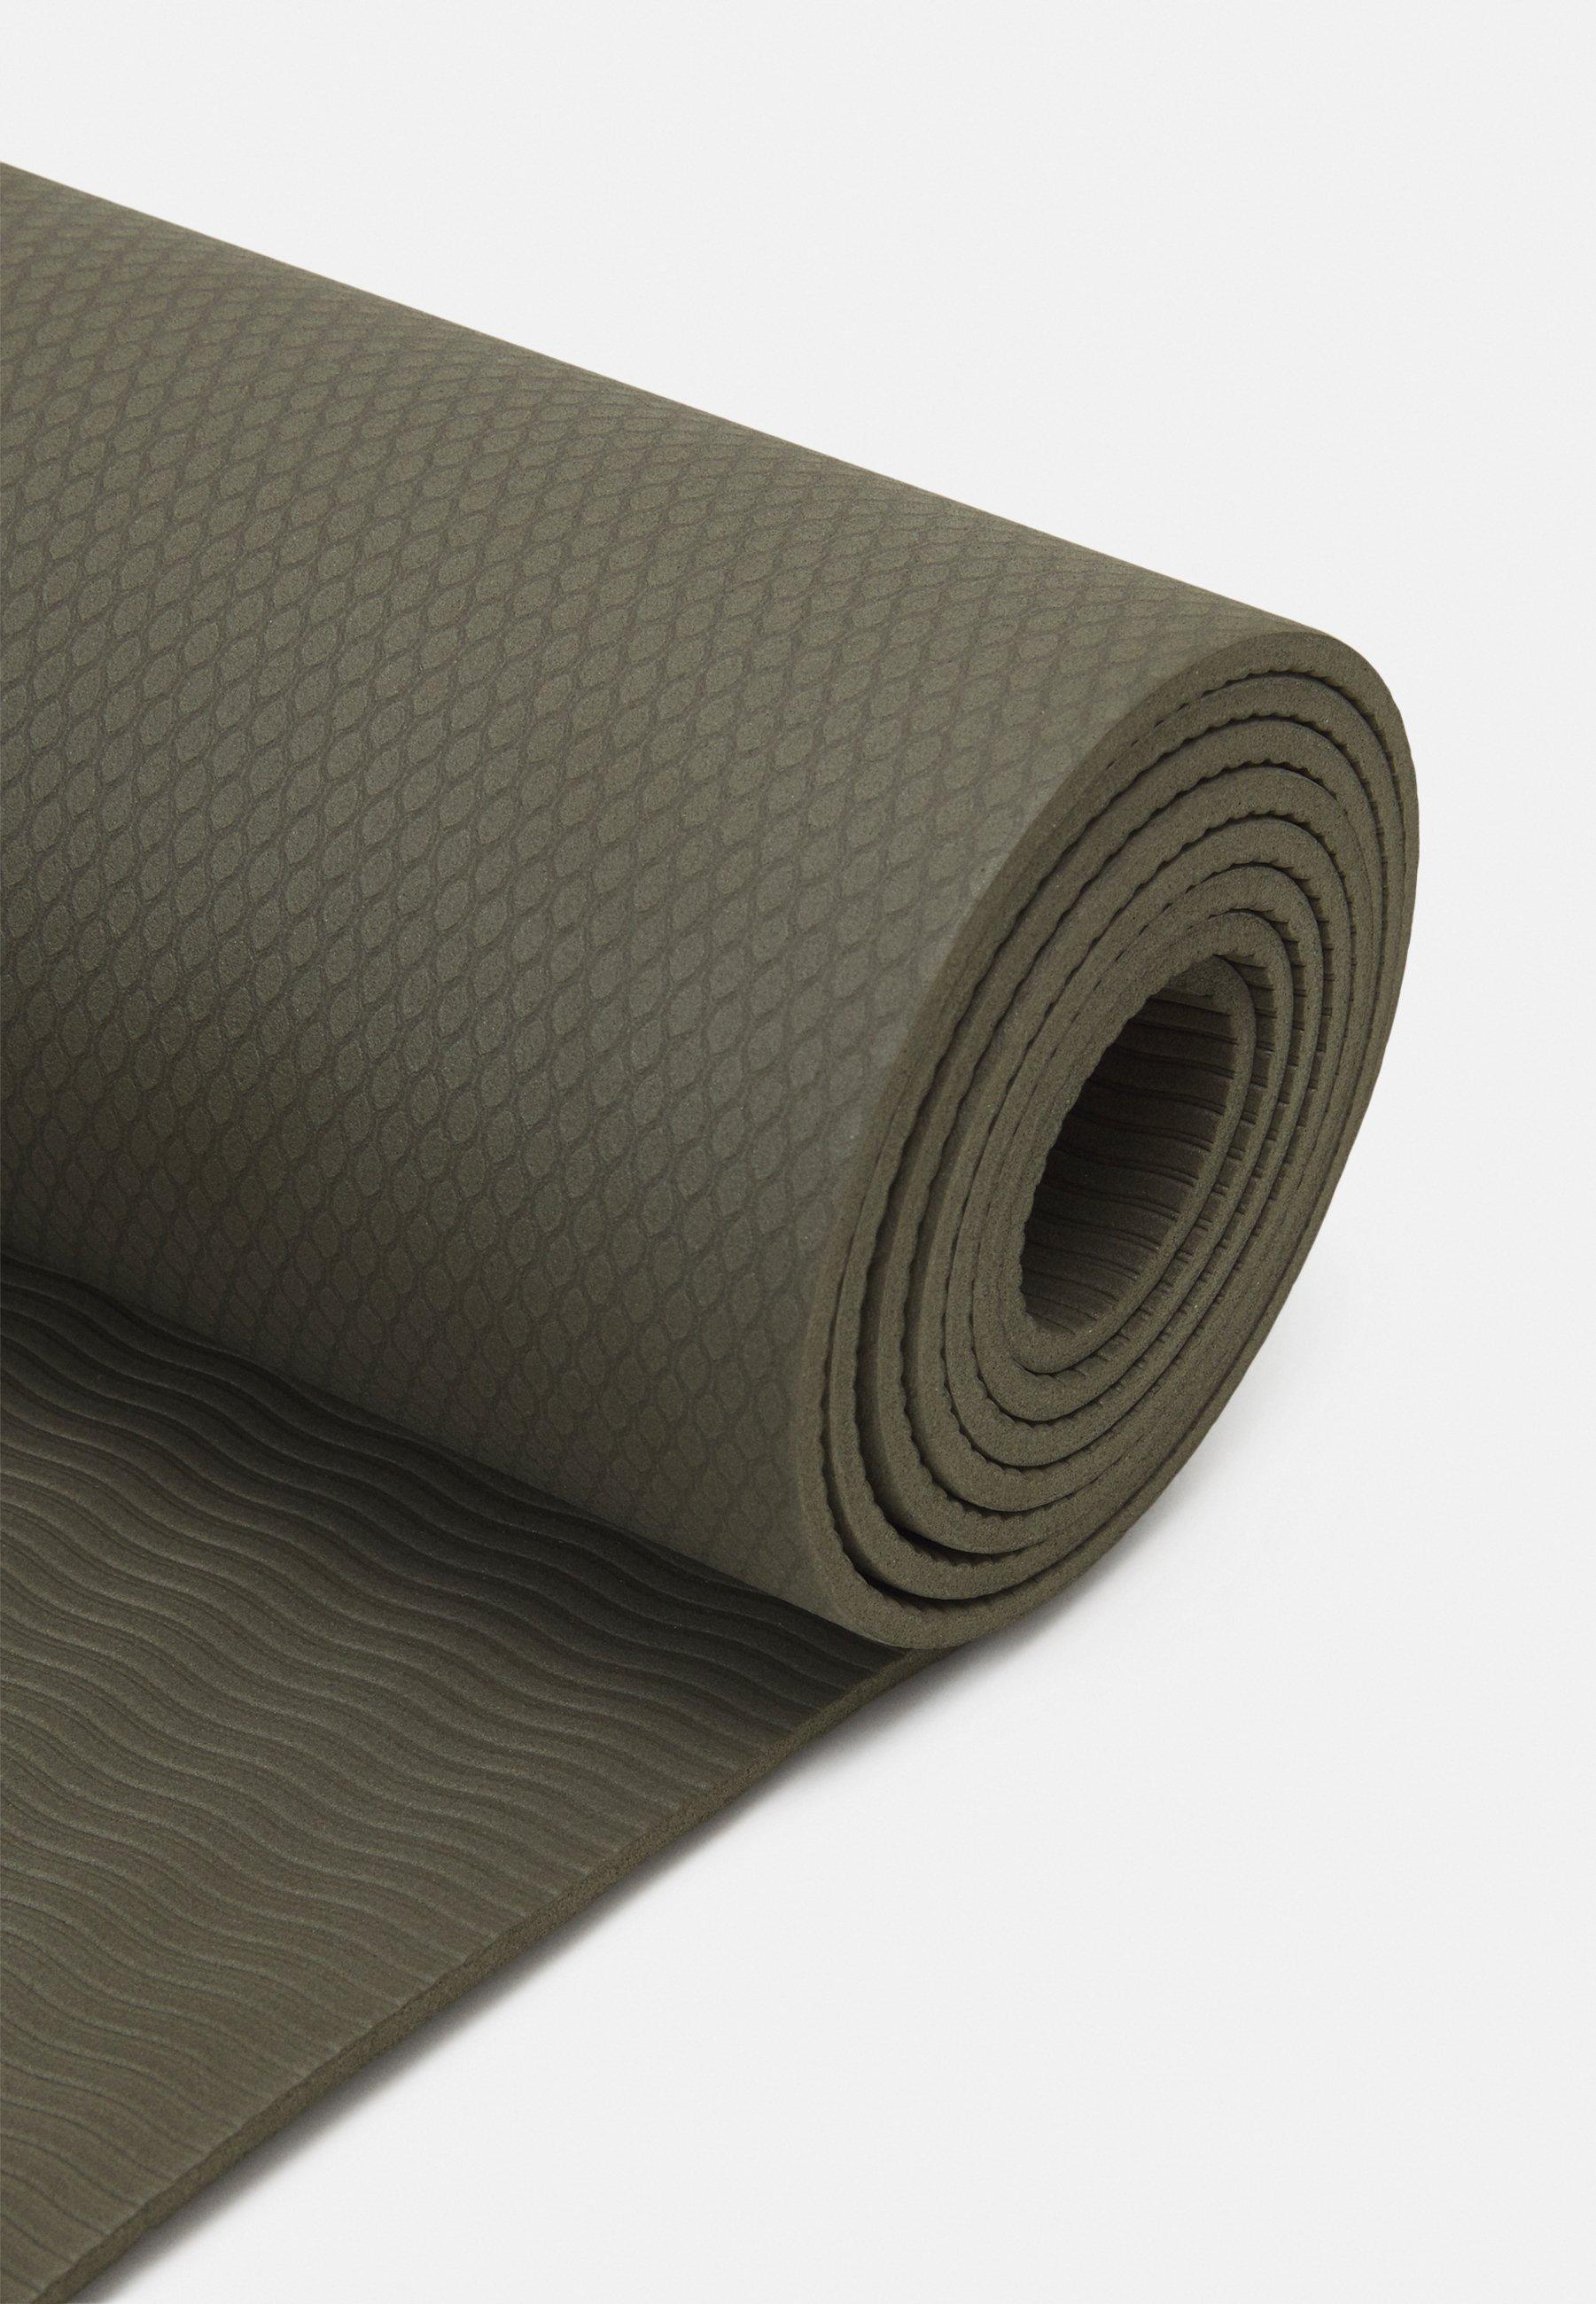 Donna EXERCISE MAT BALANCE 4MM  - Fitness / Yoga